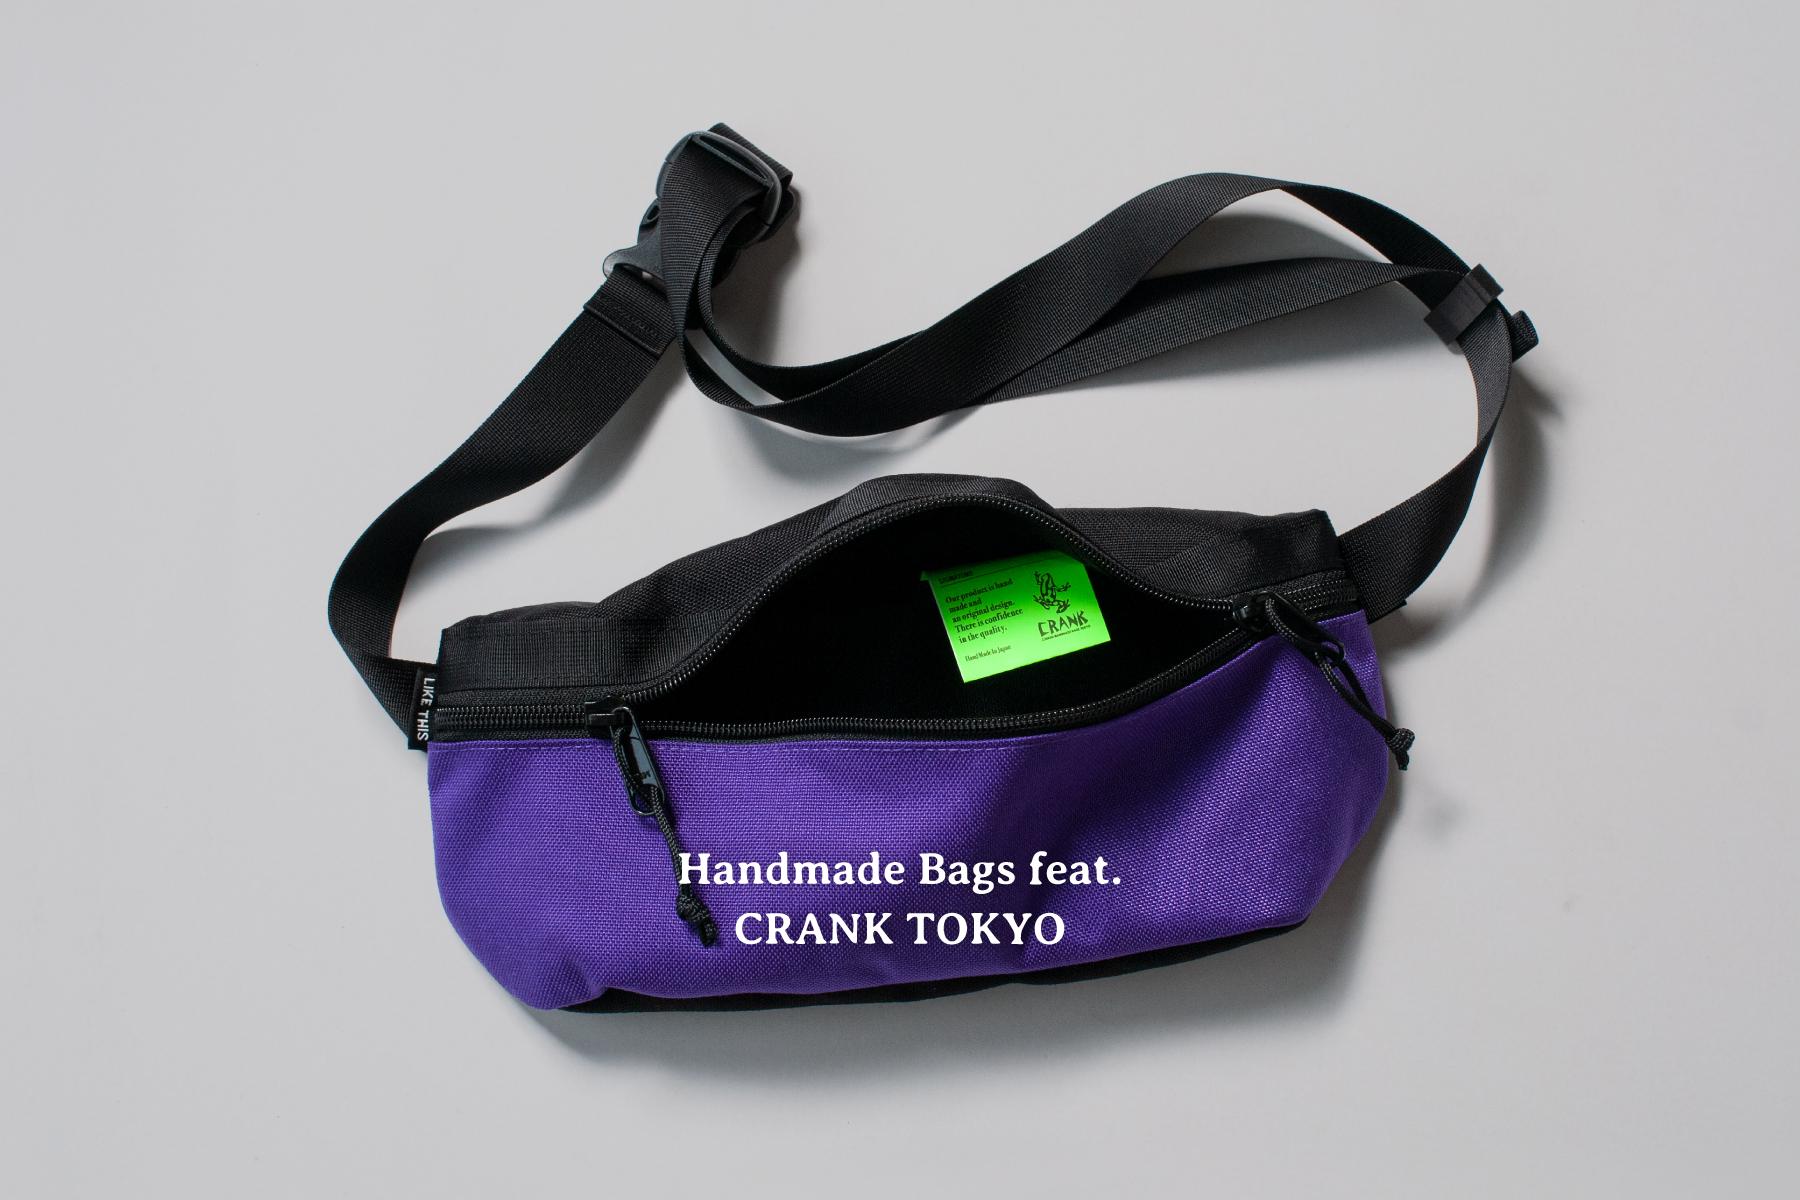 CRANK TOKYO